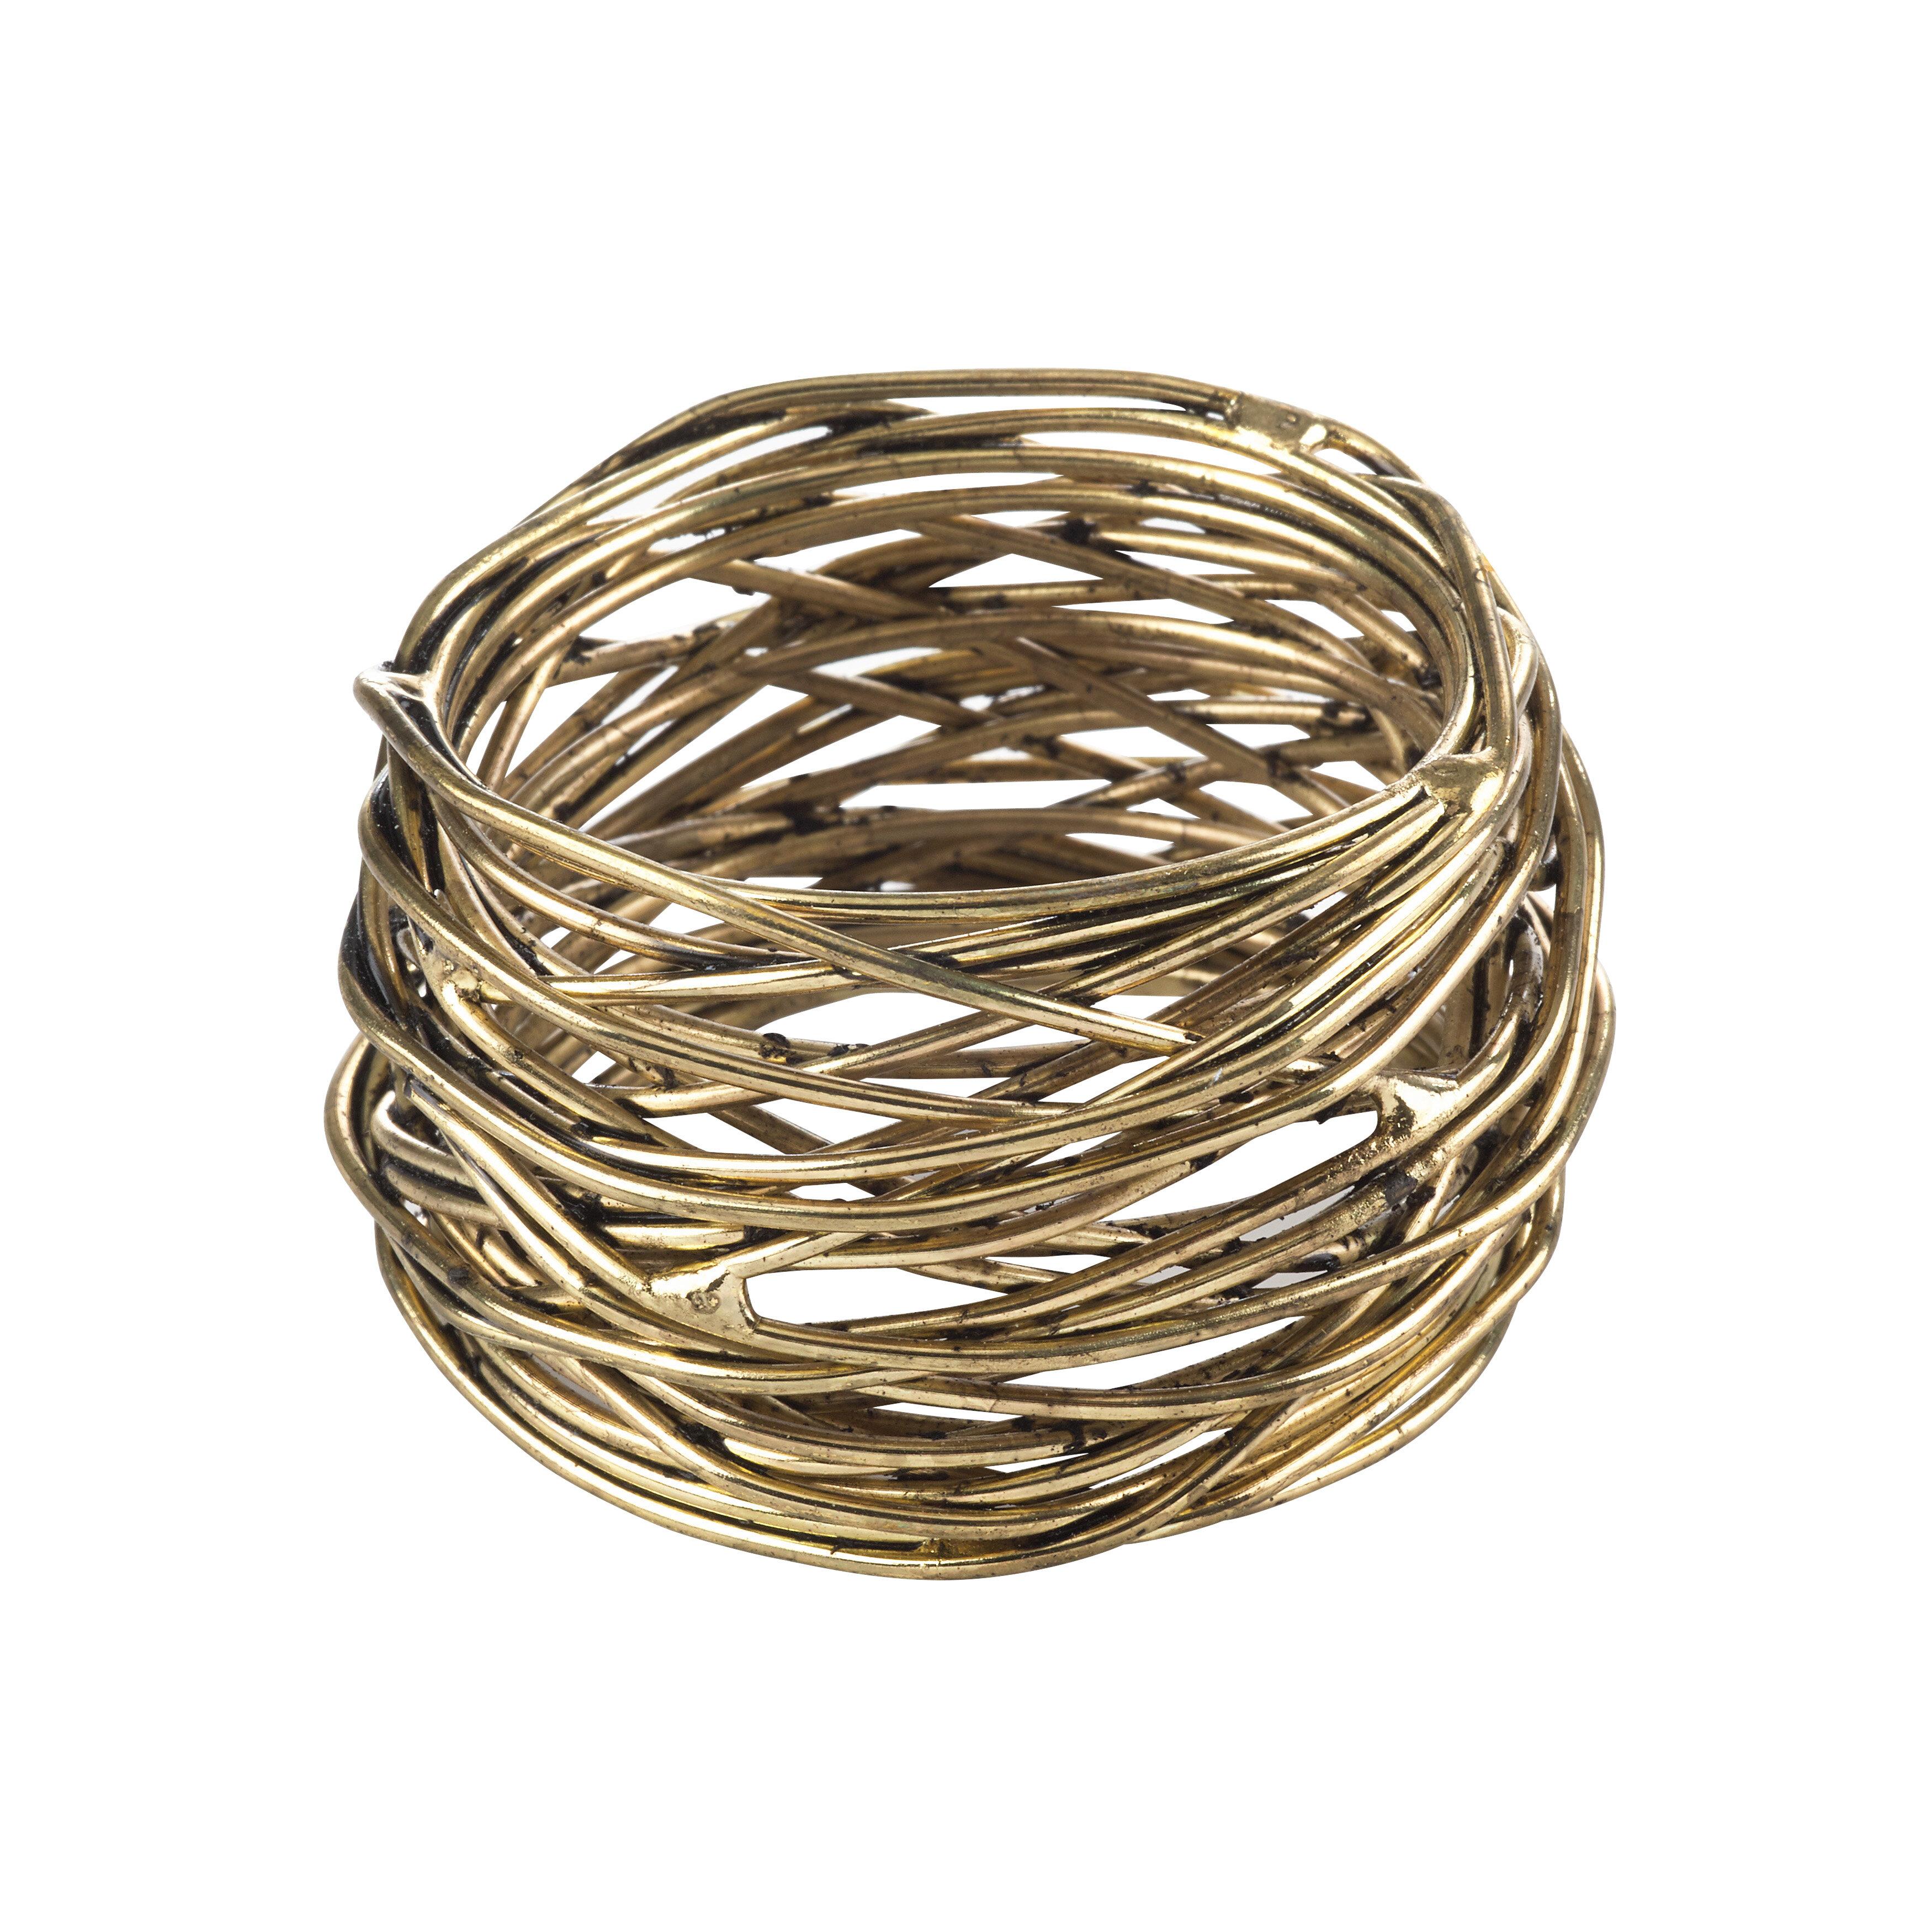 Gold Napkin Rings You Ll Love In 2021 Wayfair